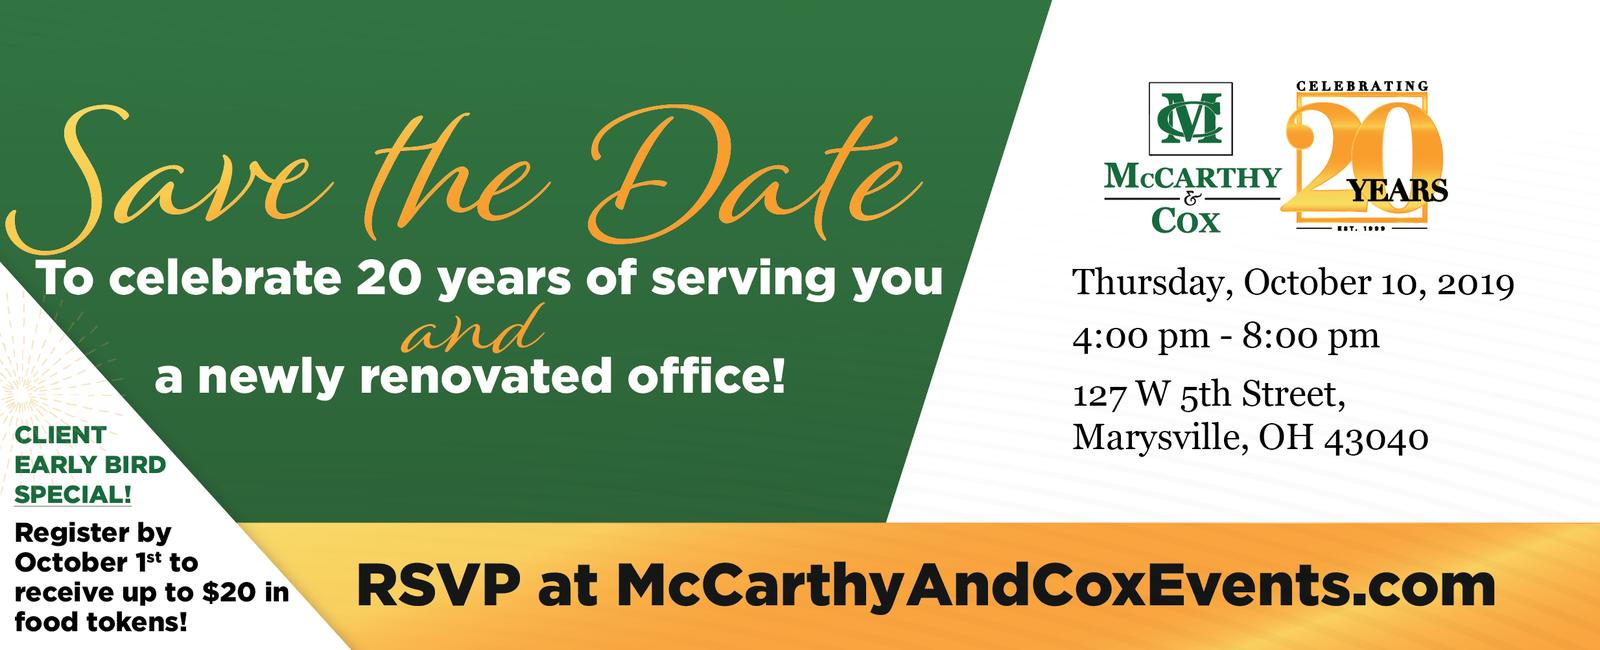 McCarthy & Cox - Home